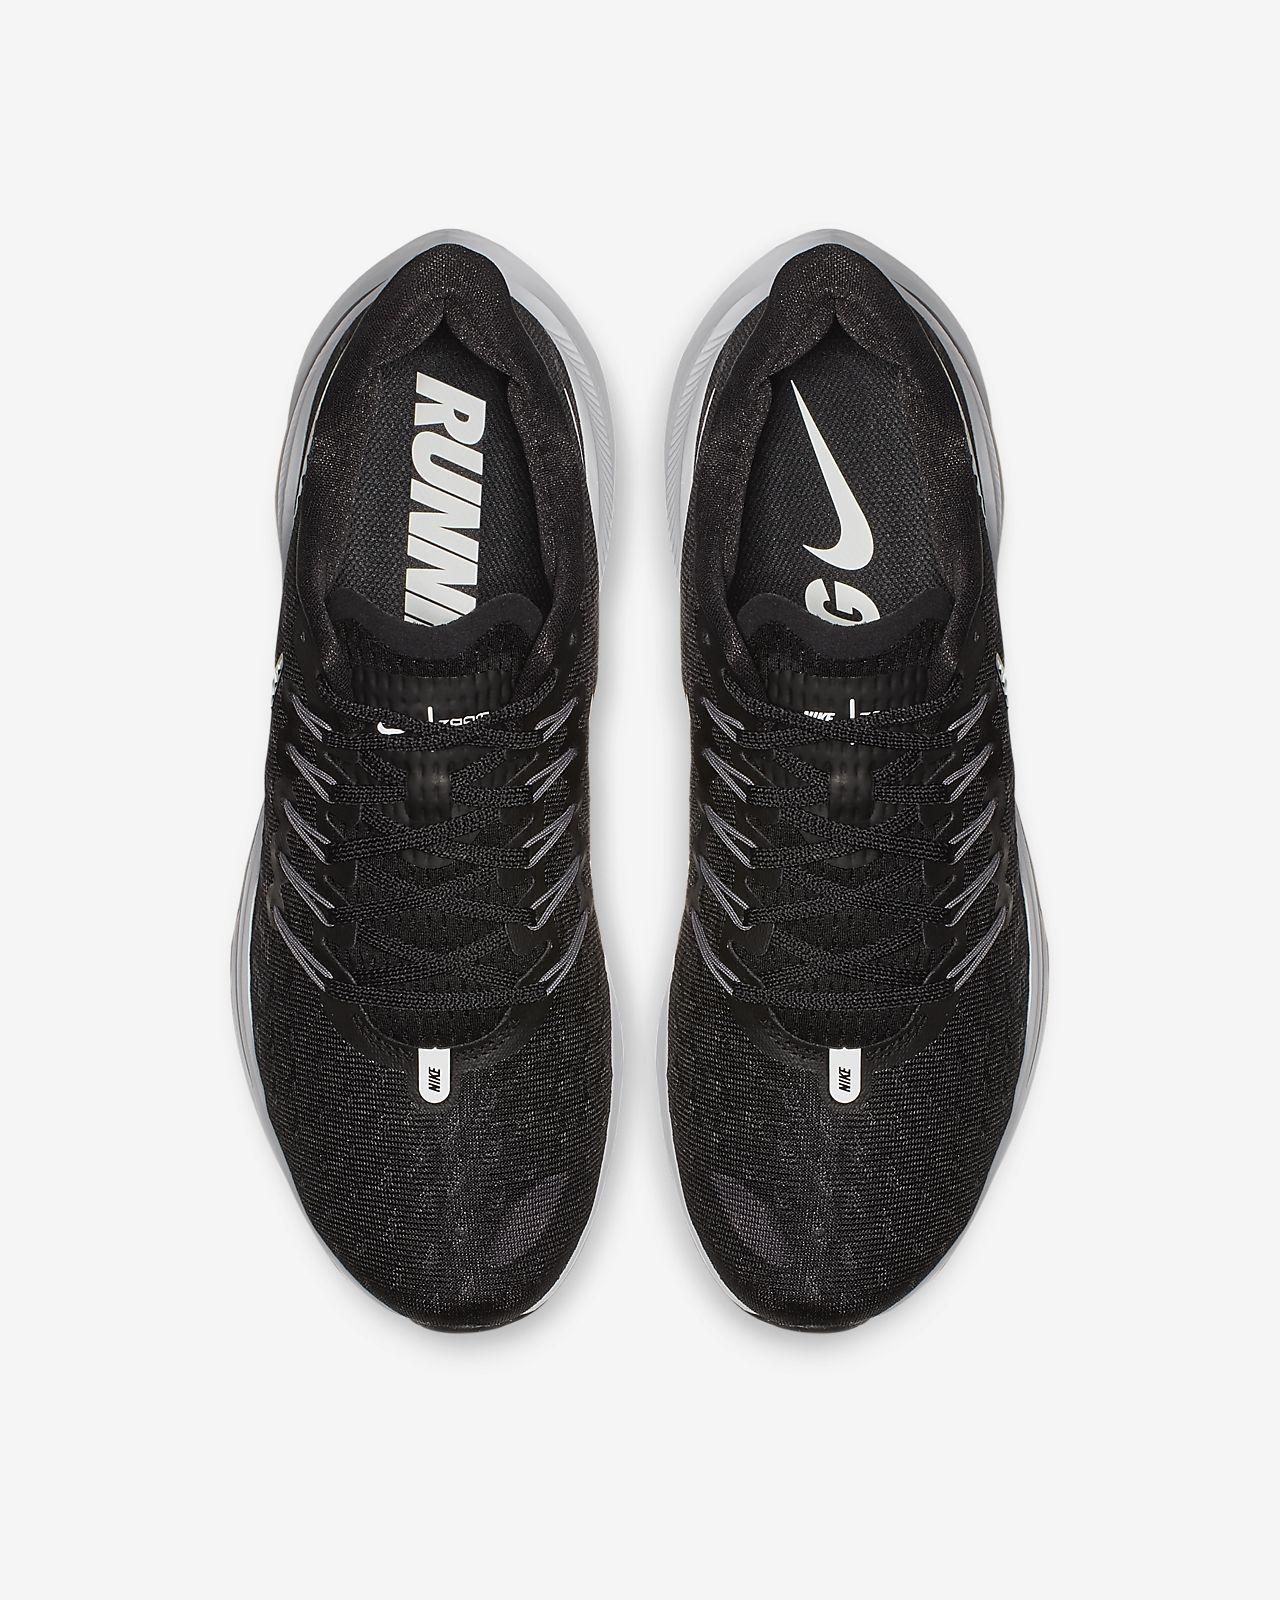 Nike Air Zoom Vomero 14 Homme Neuf Noir Blanc Gris Running Baskets AH7857-001